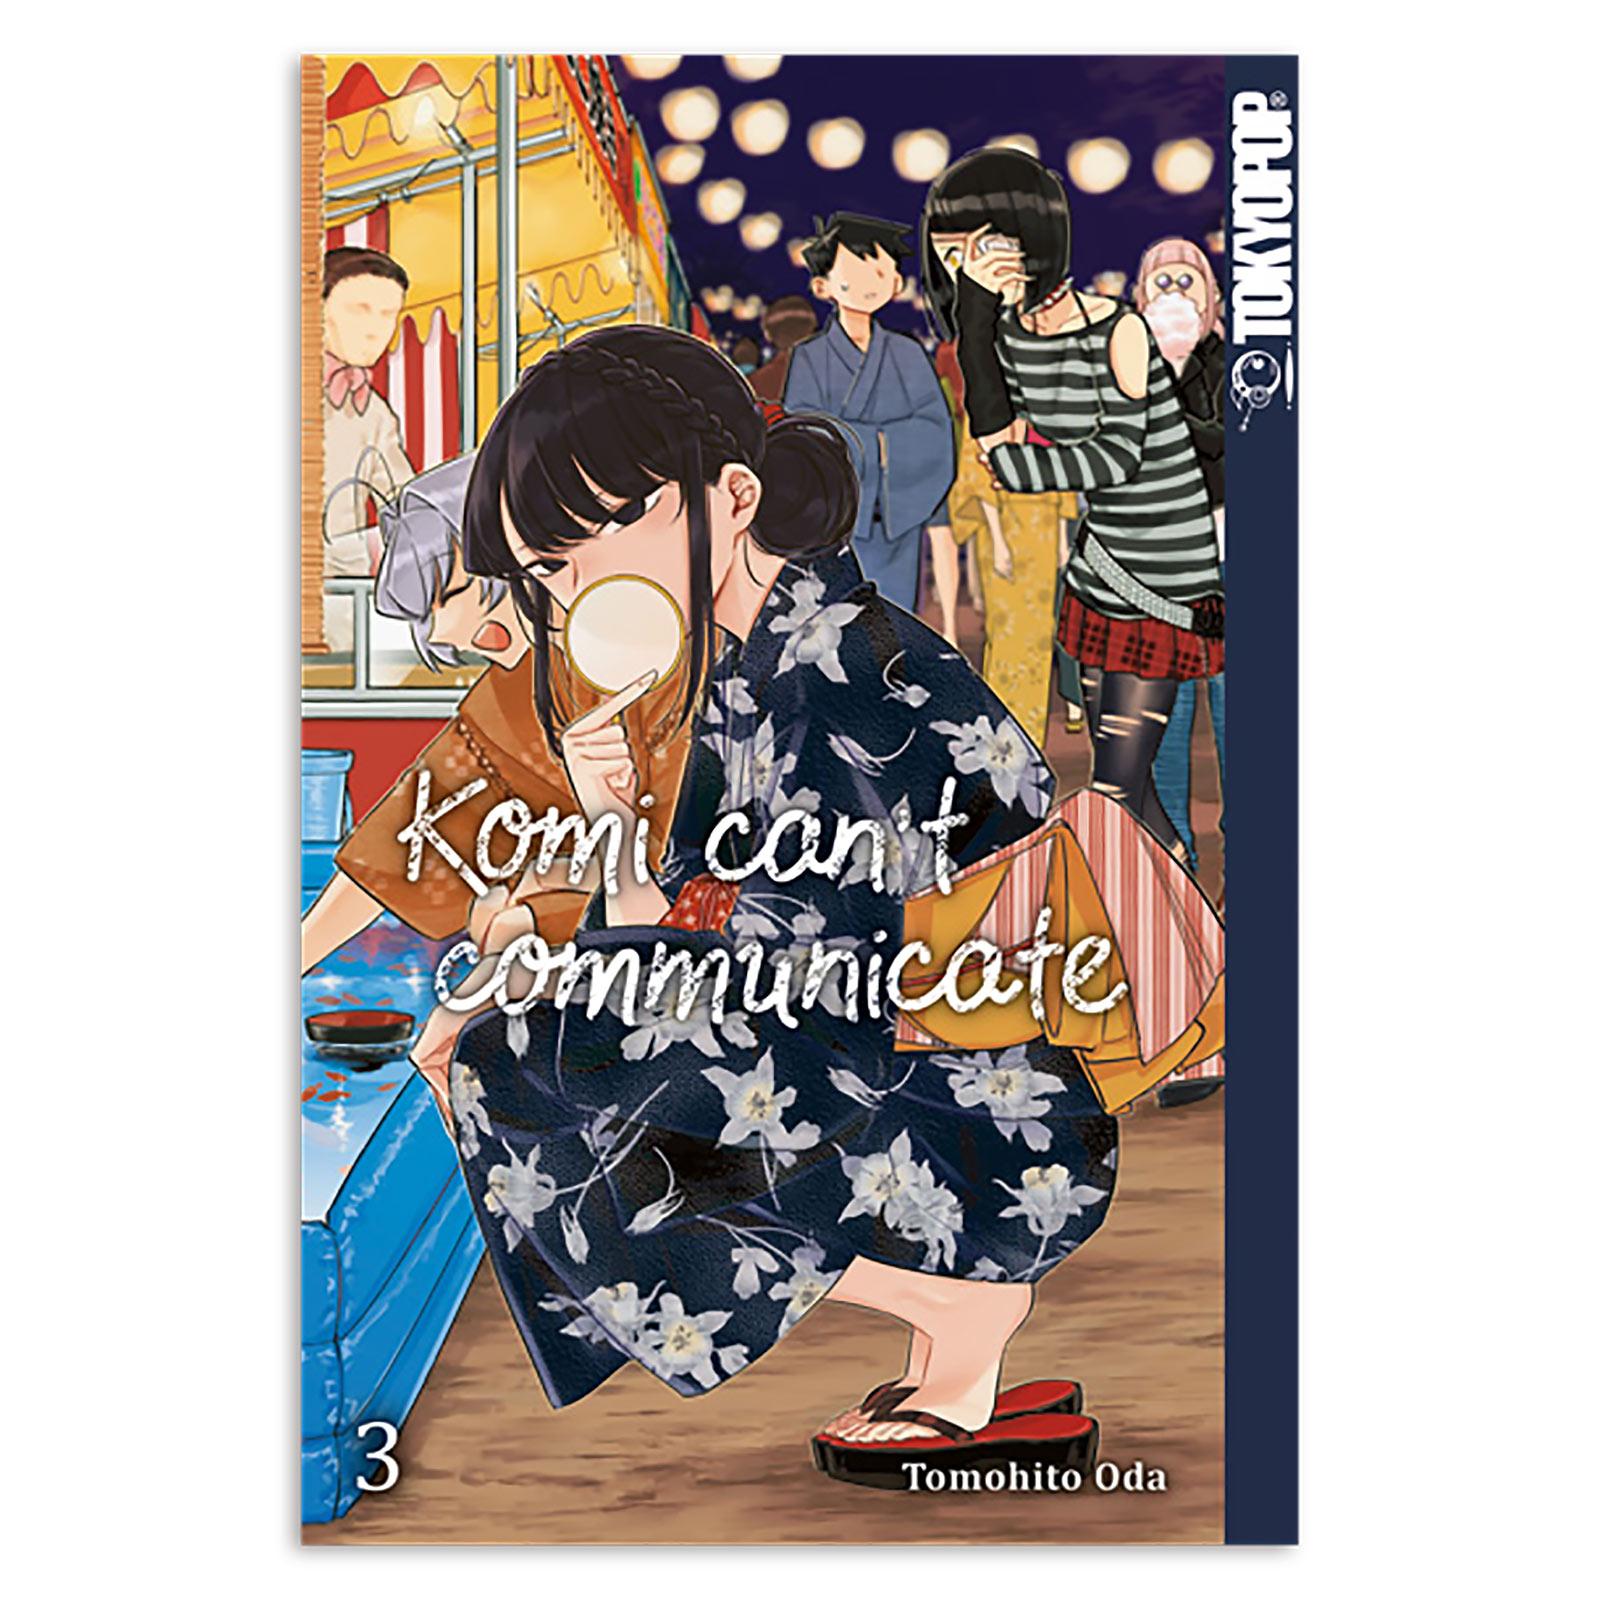 Komi can't communicate - Band 3 Taschenbuch